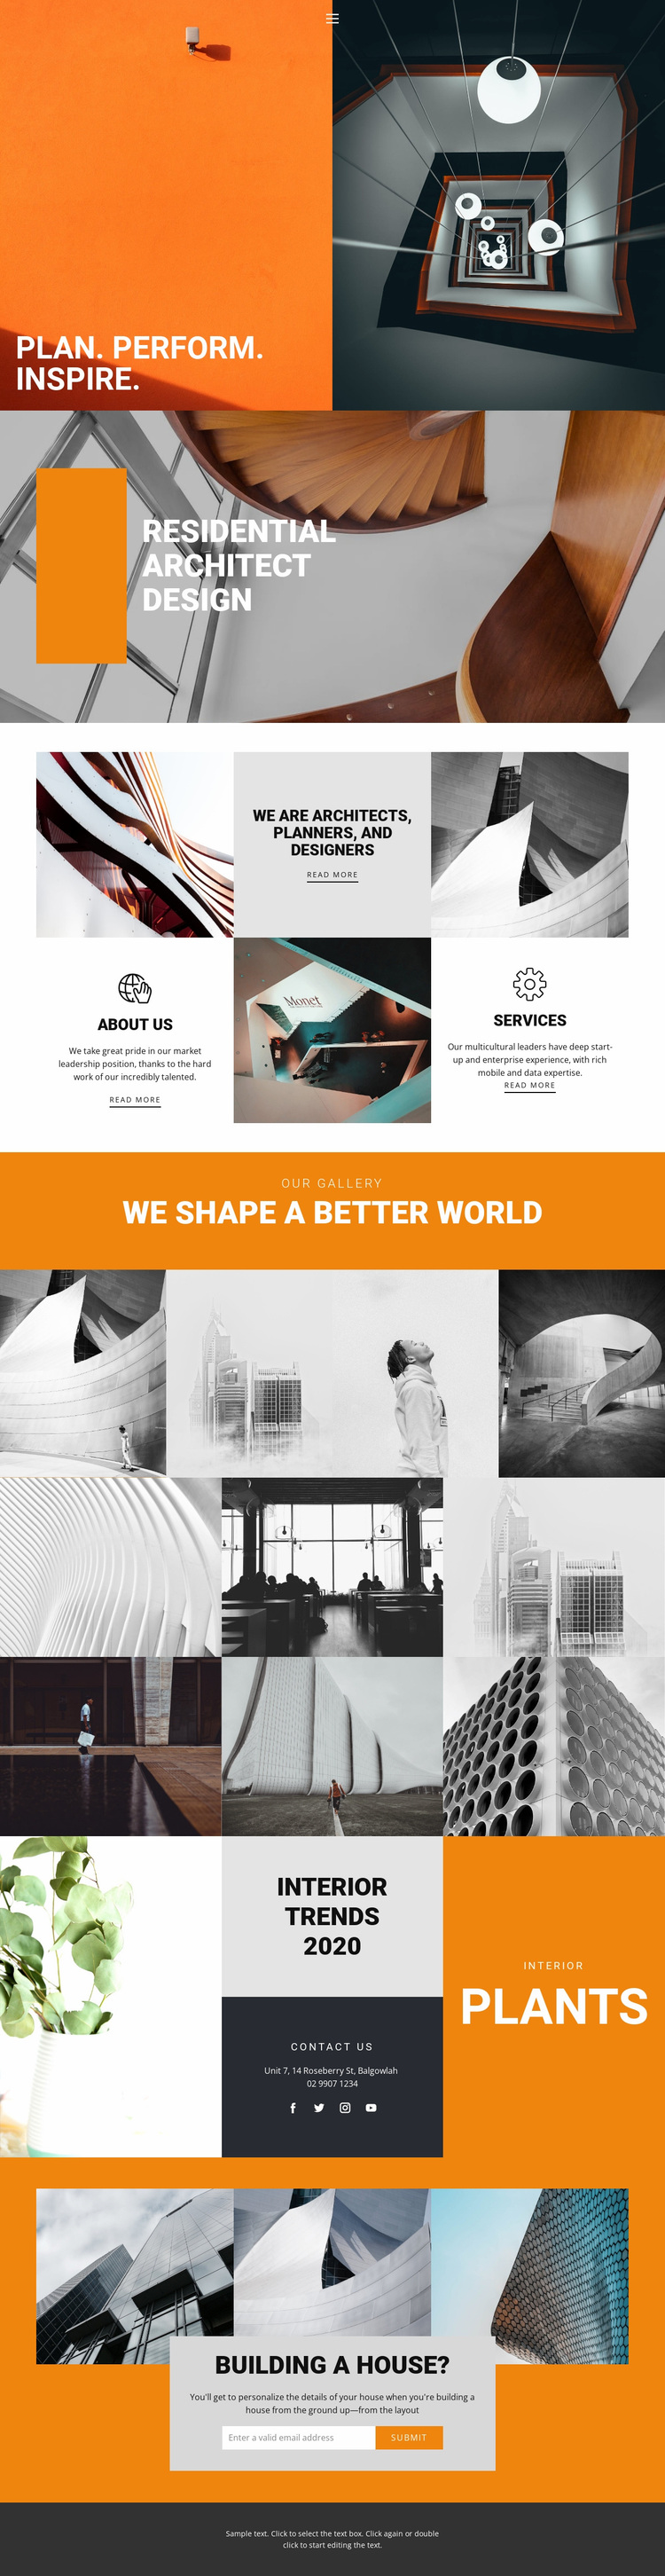 Inspiring ways of architecture Website Design